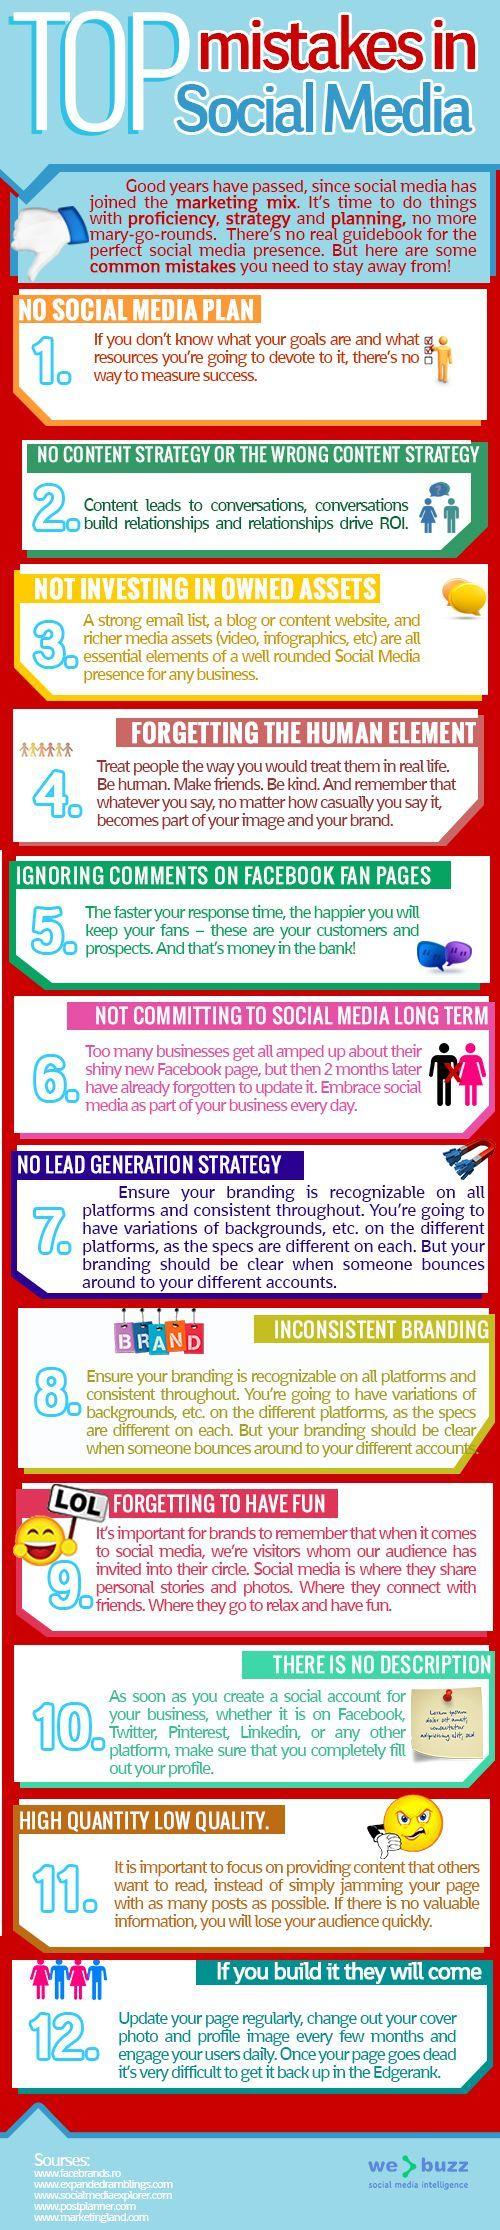 Social Media Mistakes Costing Your Business Exposure #SocialMediaMarketing #SocialMediaTrends